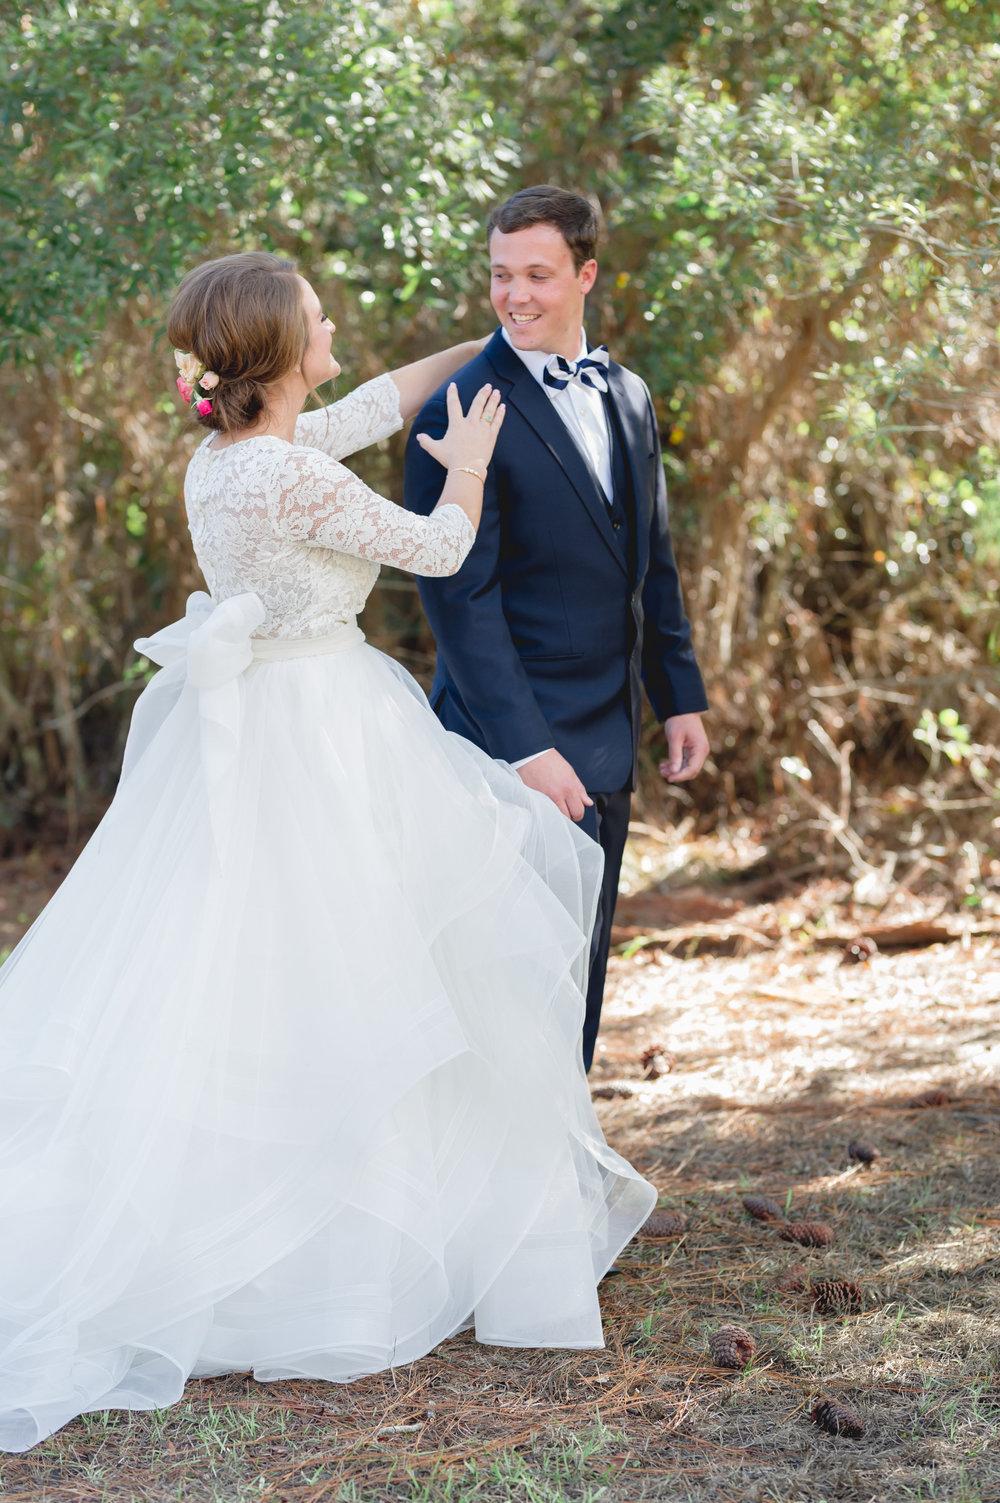 Joe Kendall Romantic Boho Wedding Gulf Shores AL-Bride and Groom-0080.jpg